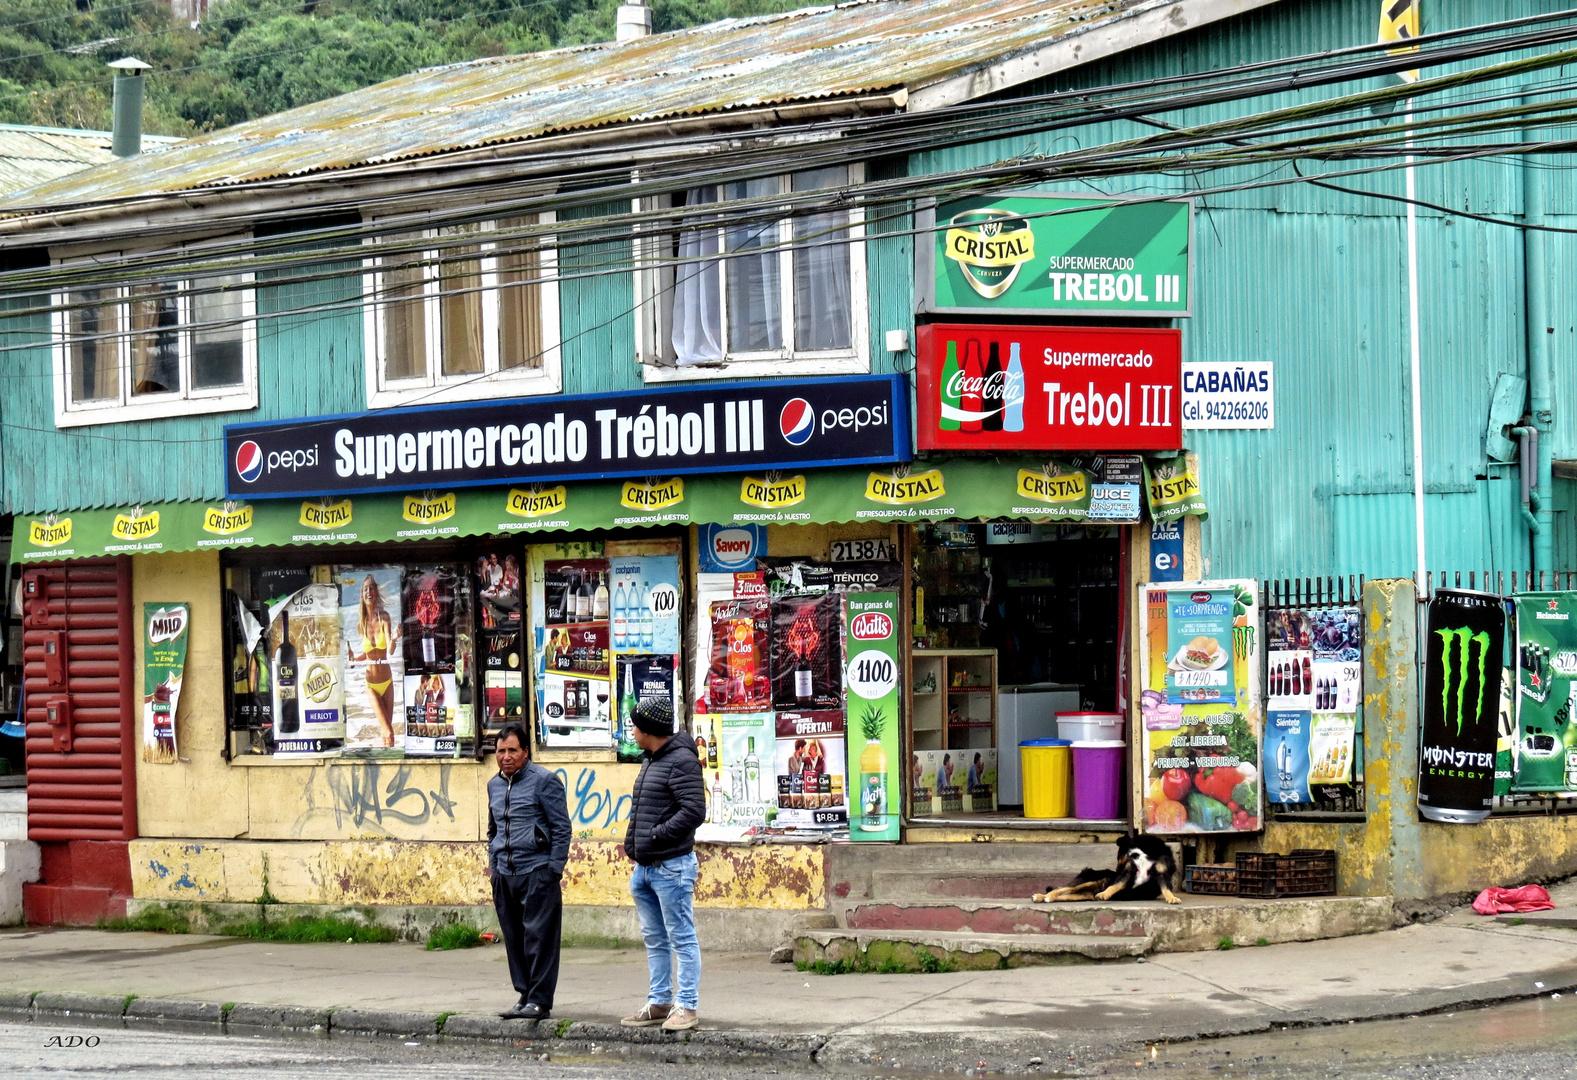 Supermercado Trebol III